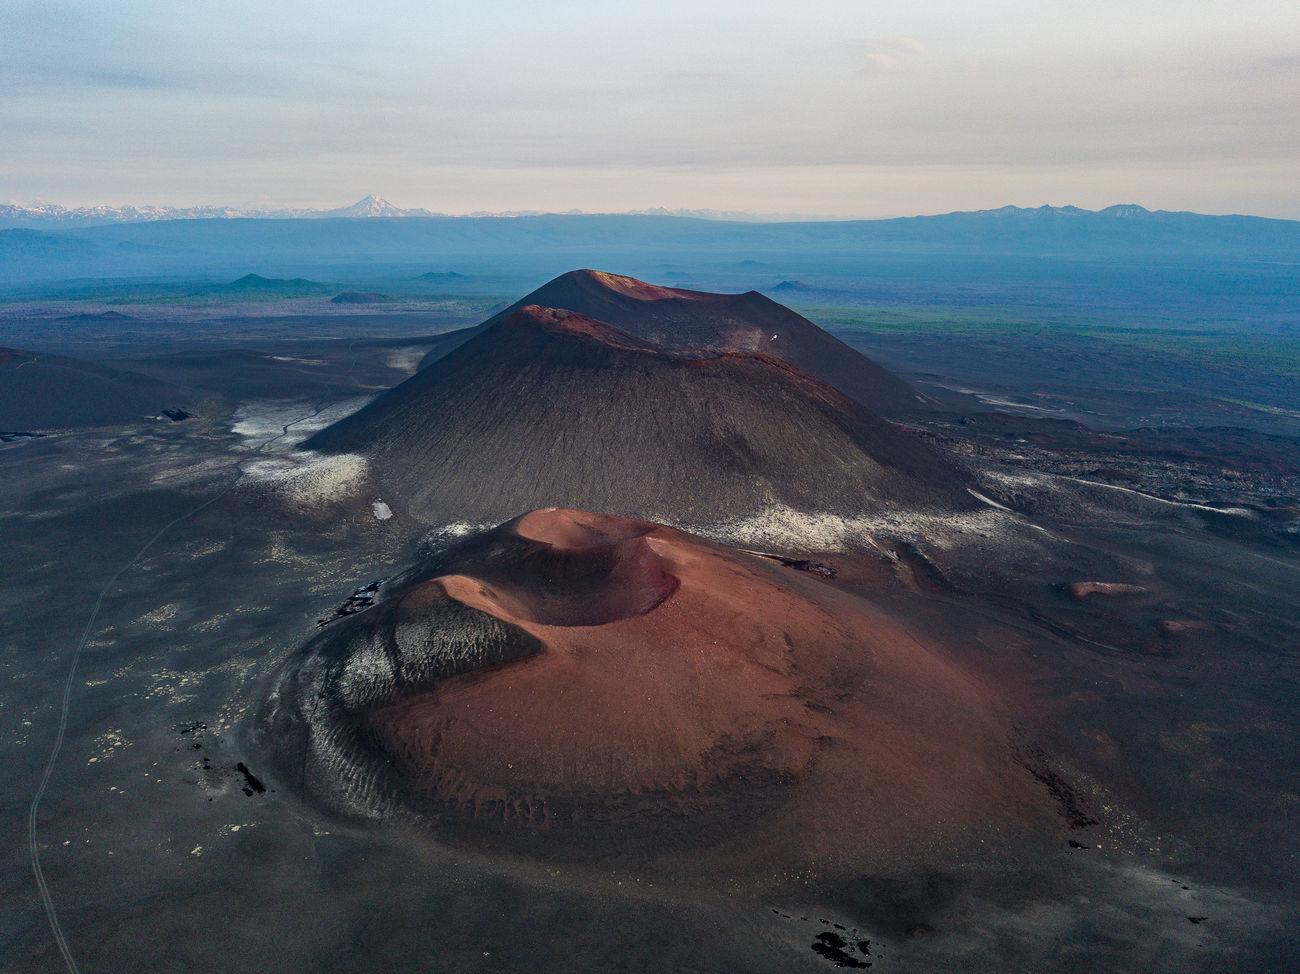 volcano, nature, beauty in nature, scenics, geology